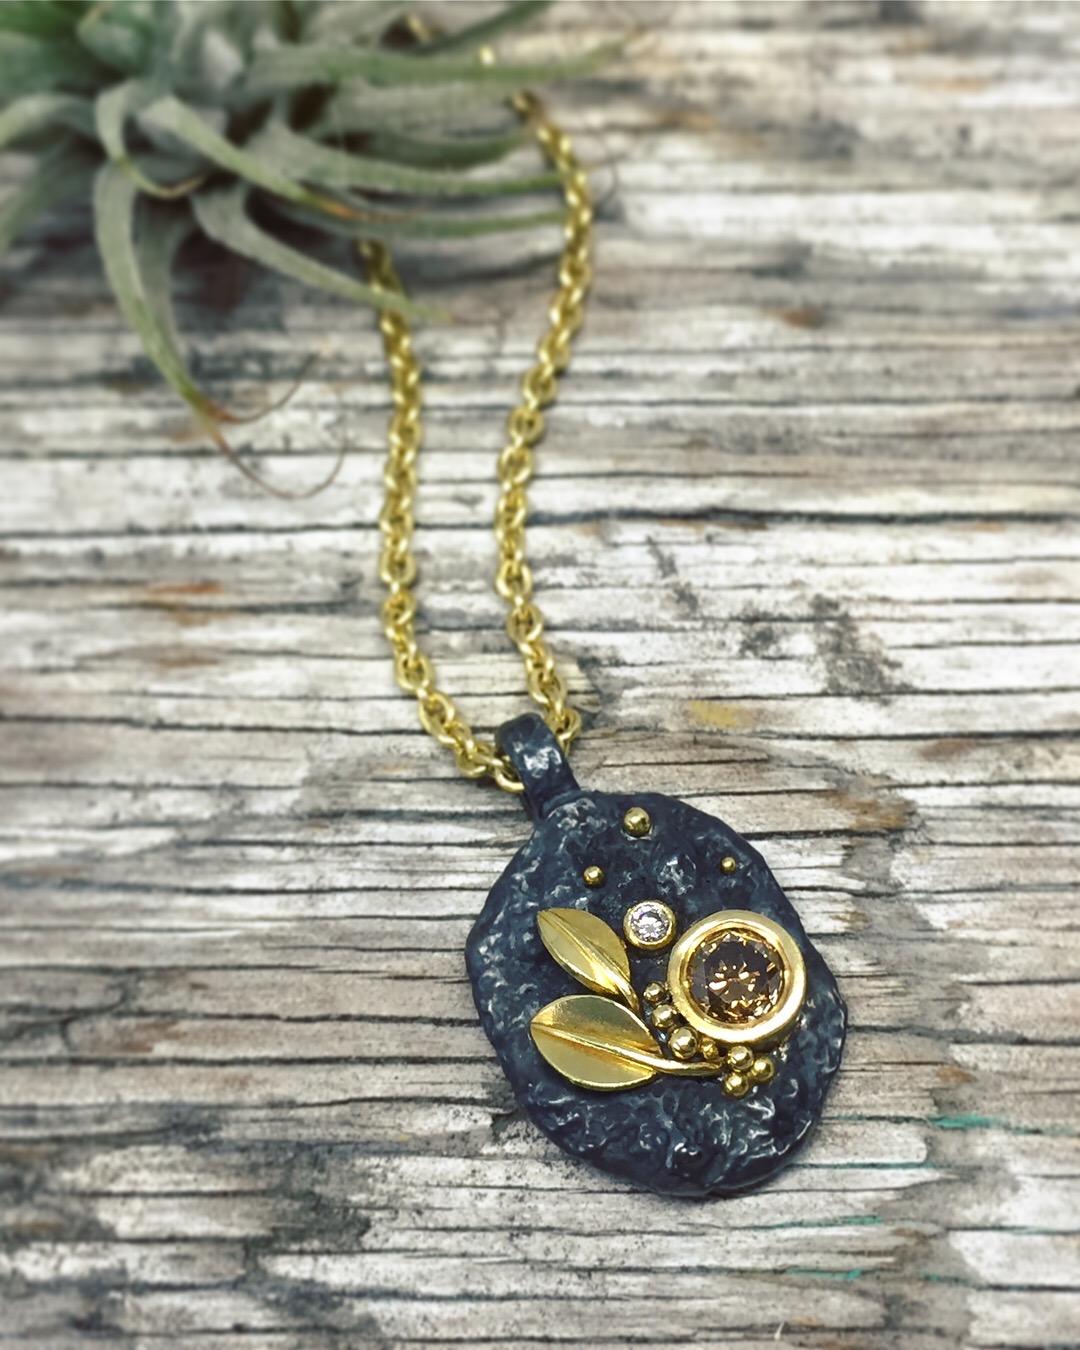 verena-strigler-champagne-diamond-18k-yellow-gold-leaf-pendant-black-sterling-silver-vancouver.jpg